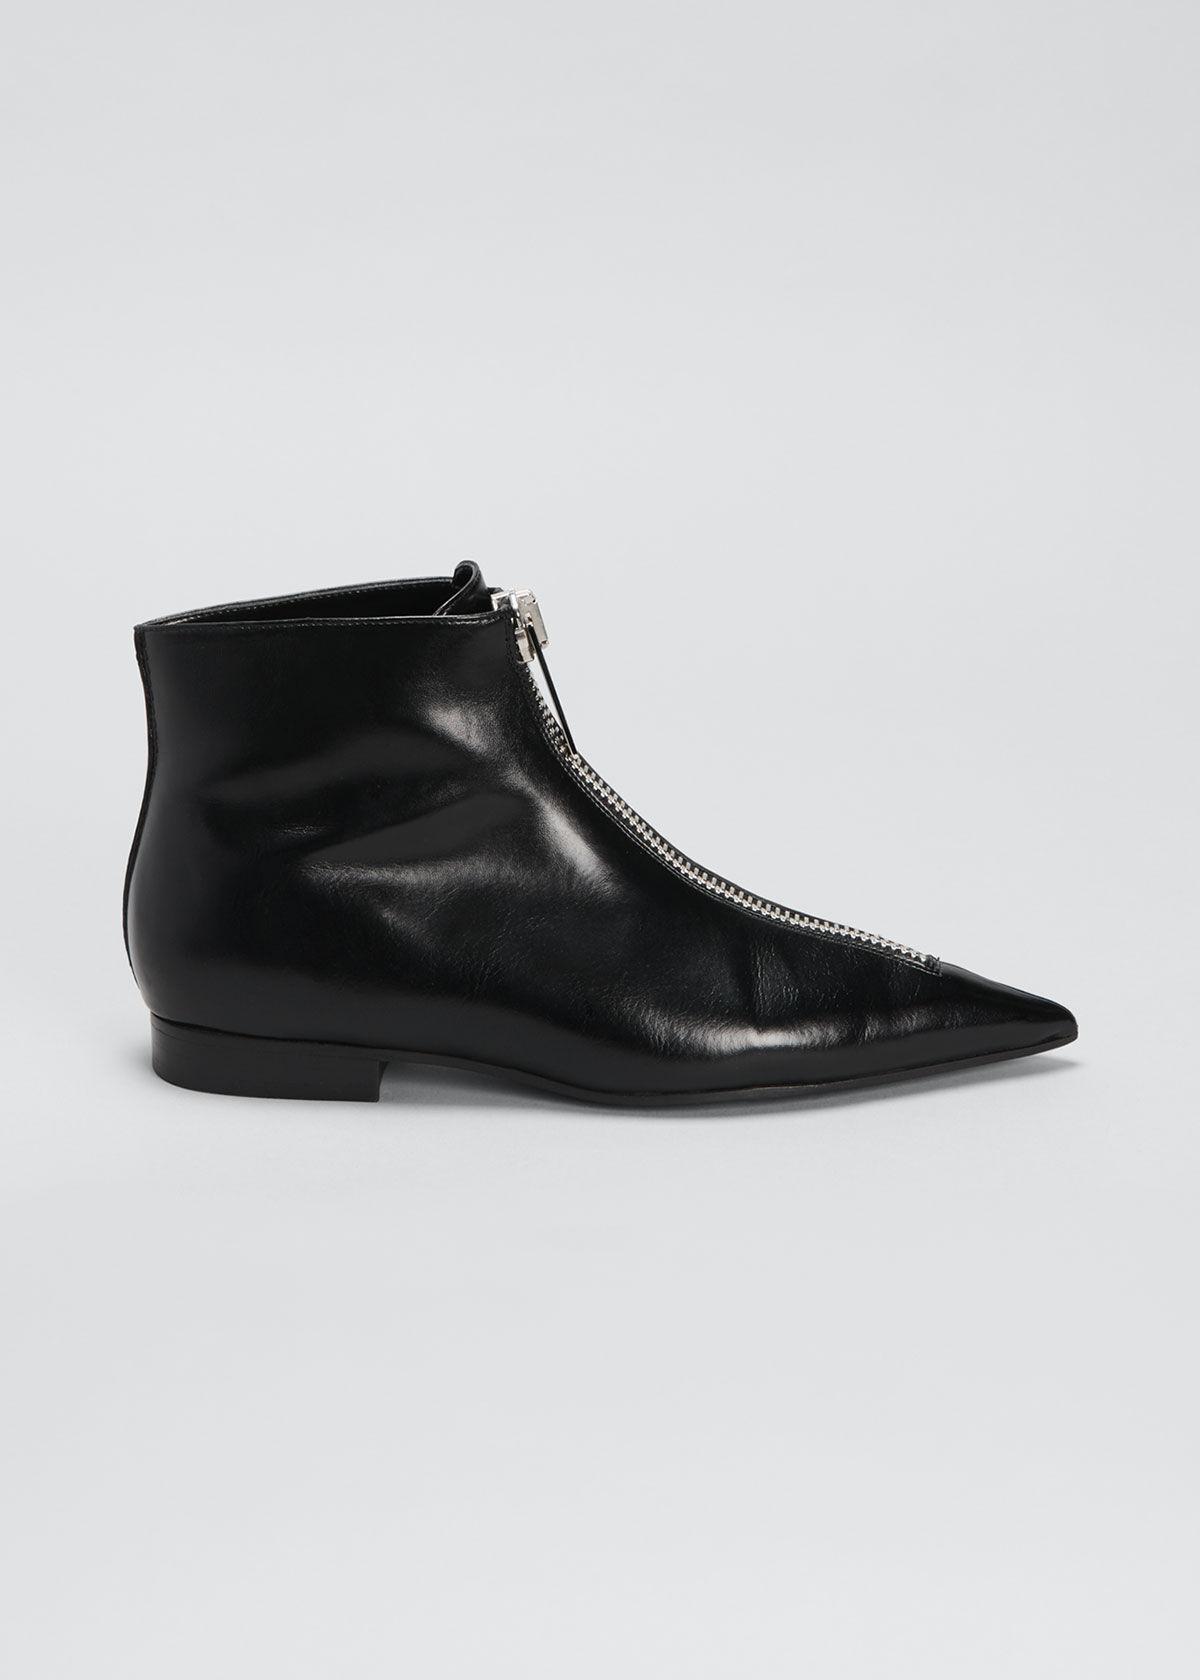 Stella McCartney Zipit Shoes  - female - BLACK - Size: 11B / 41EU